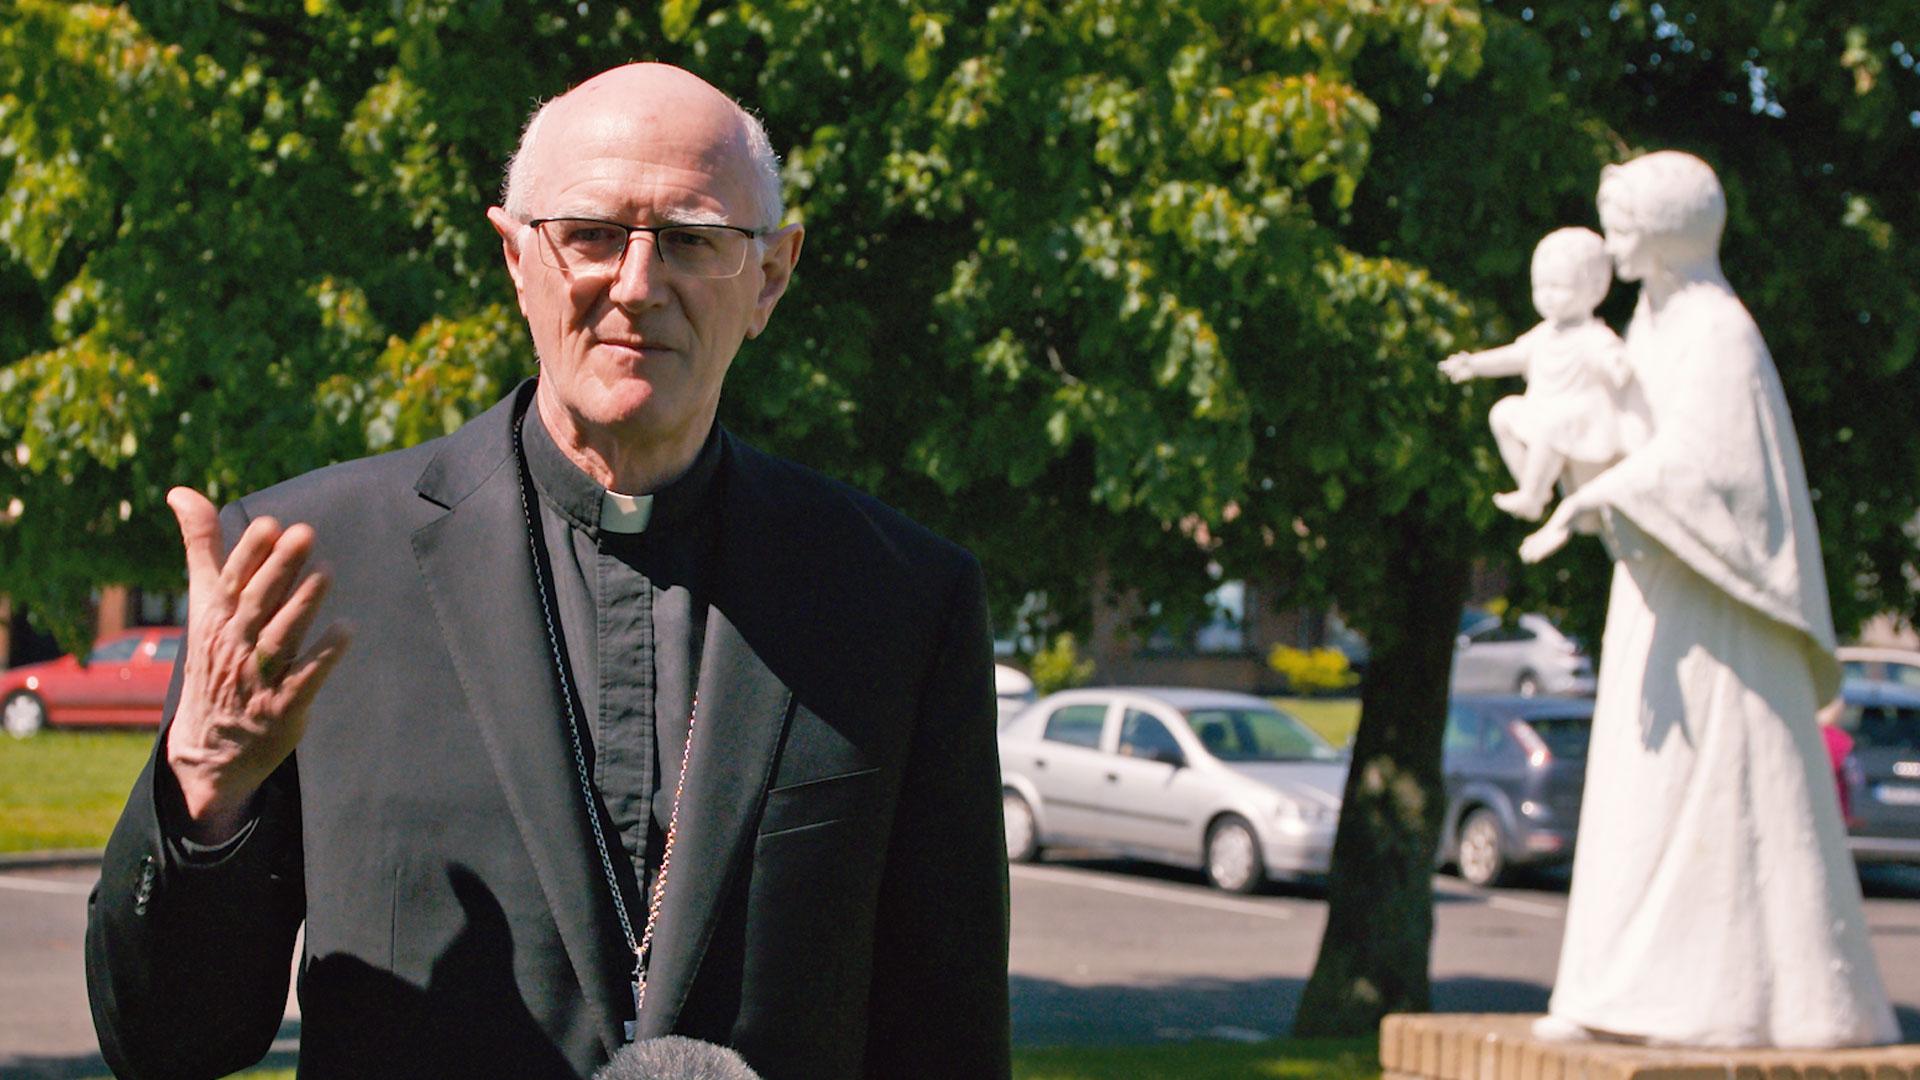 'Building Hope' – Renewal Taskforce for Dublin Archdiocese